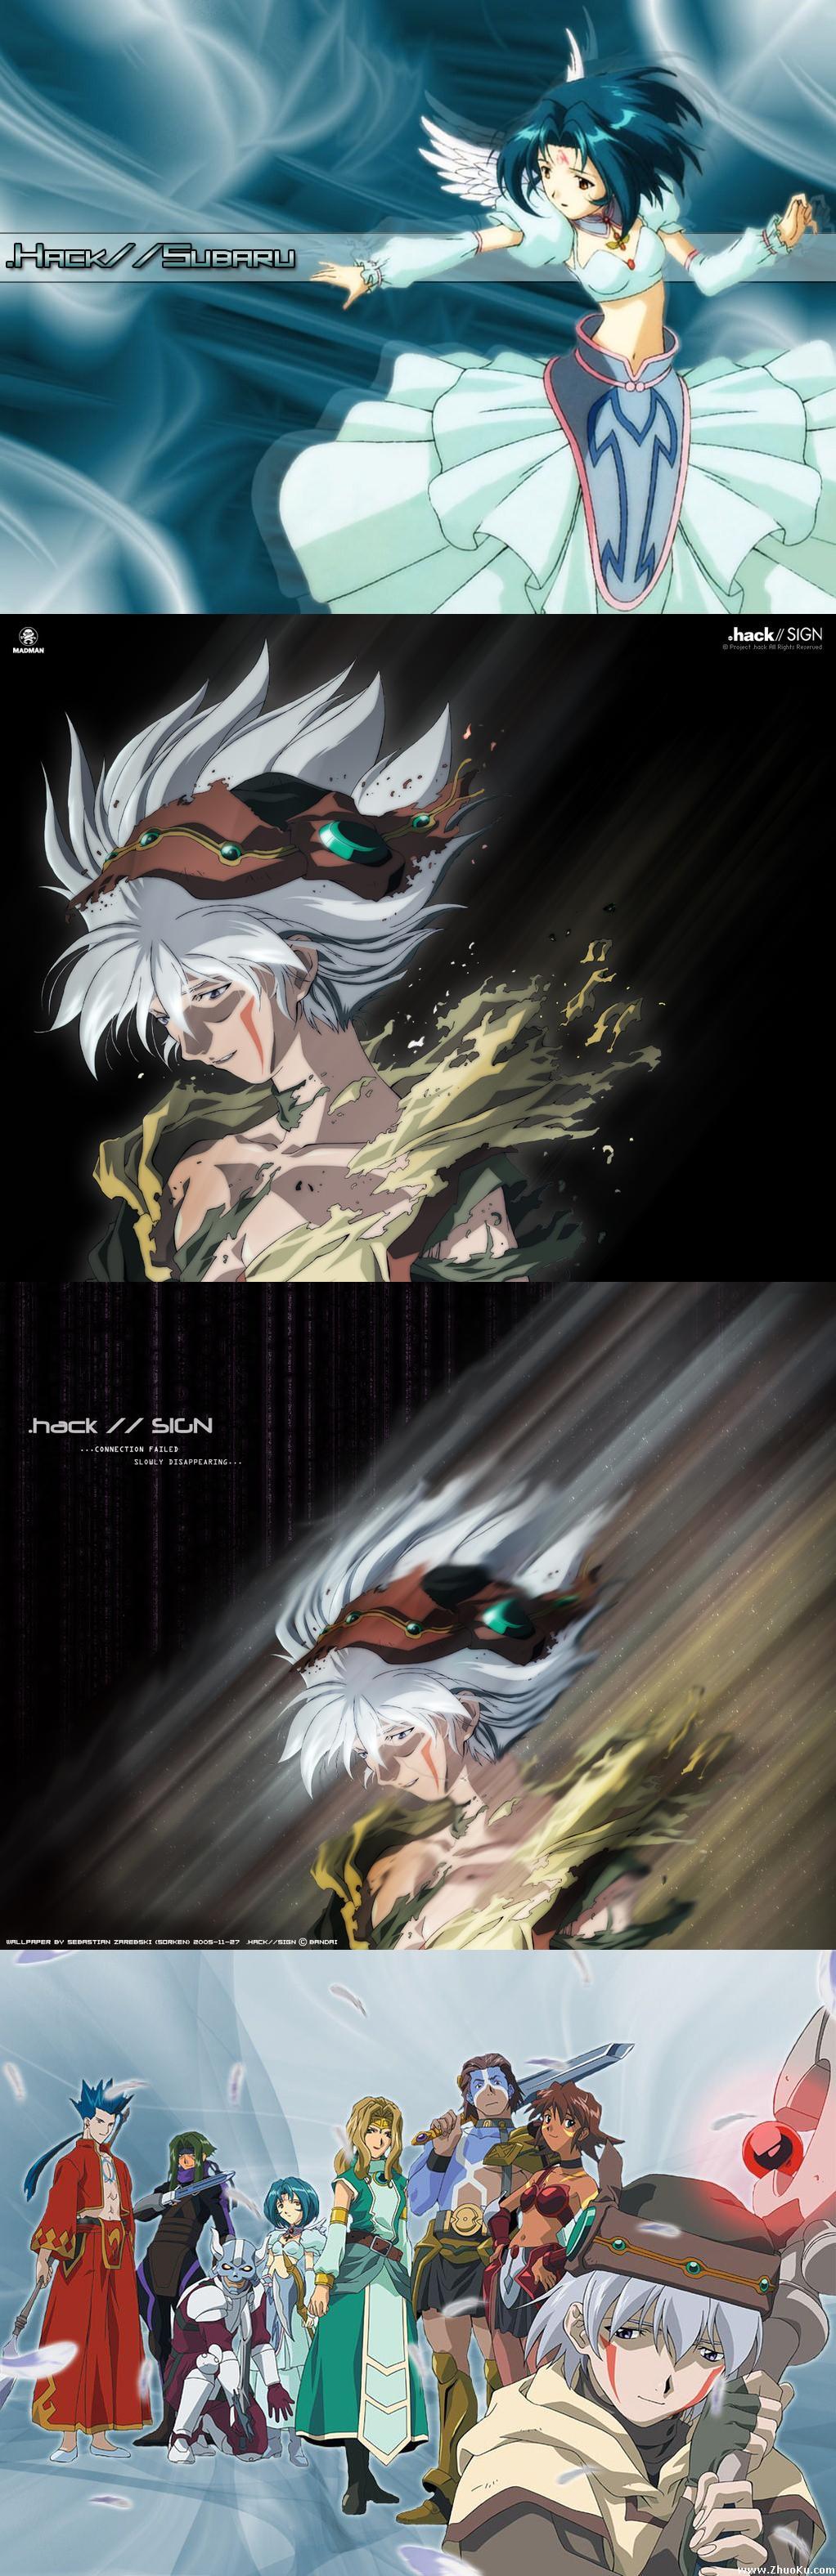 Dot Hack Sign Dot hack, Awesome anime, Anime